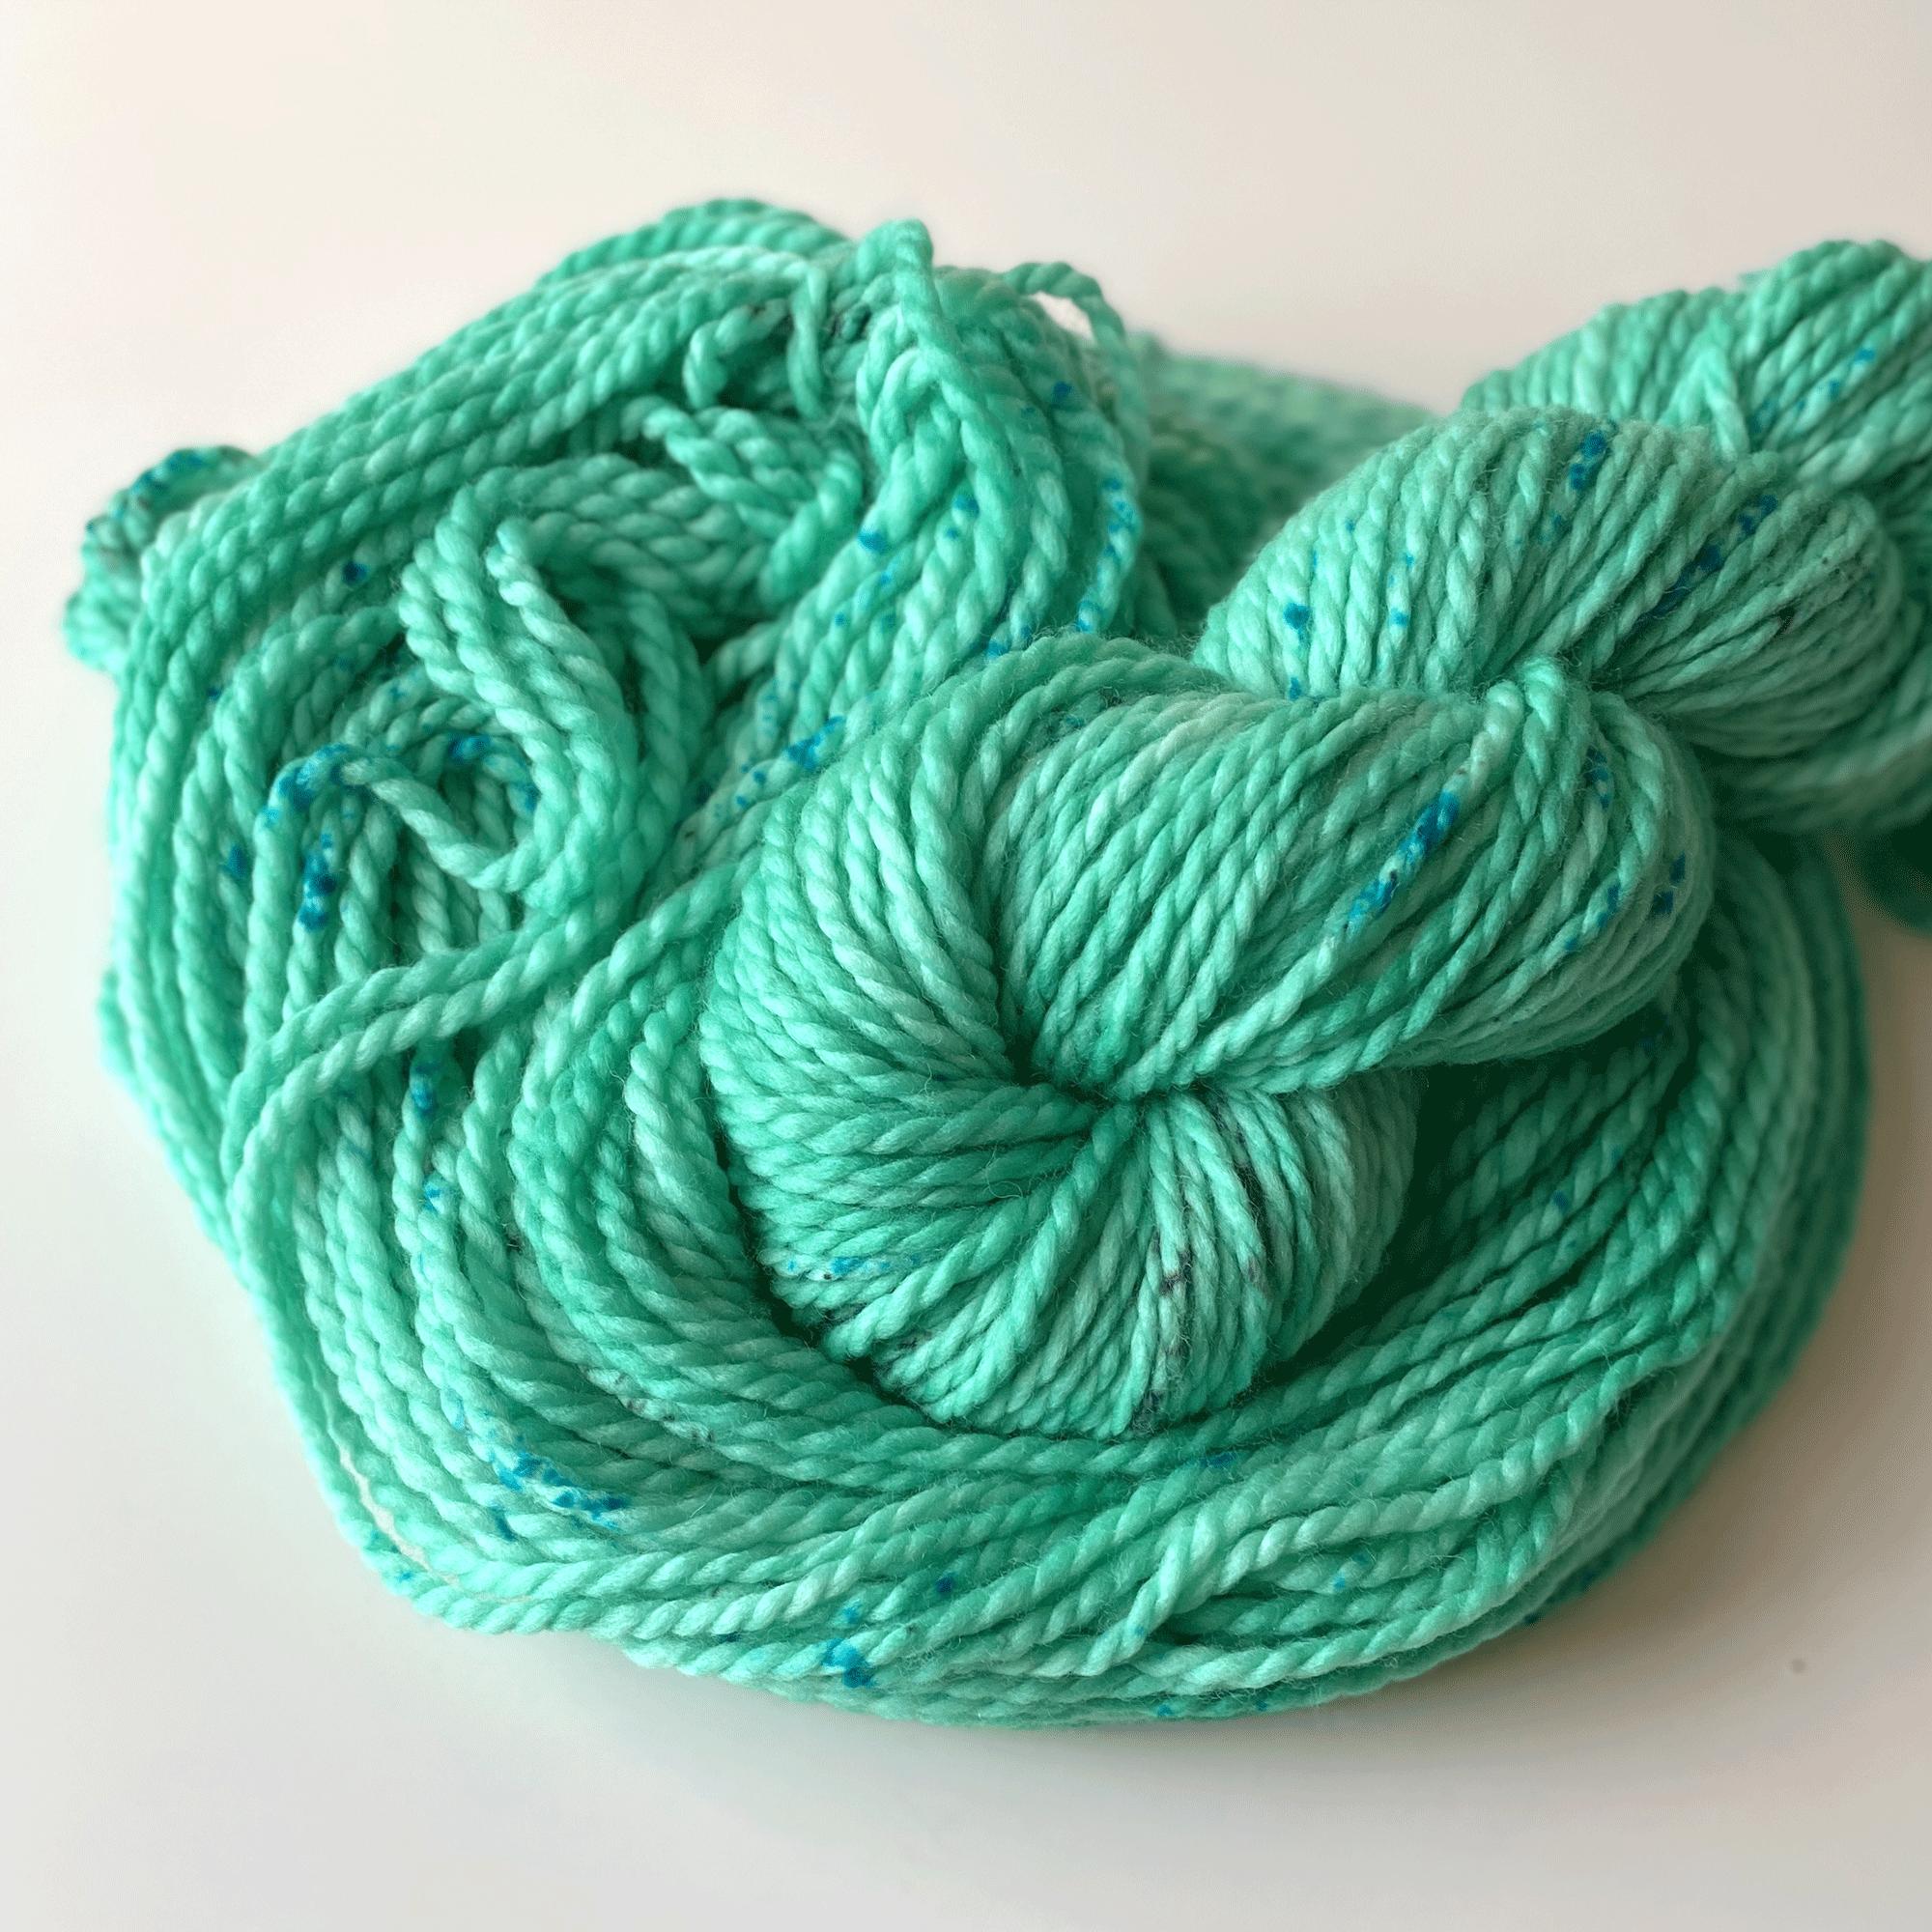 Mint green bulky yarn.